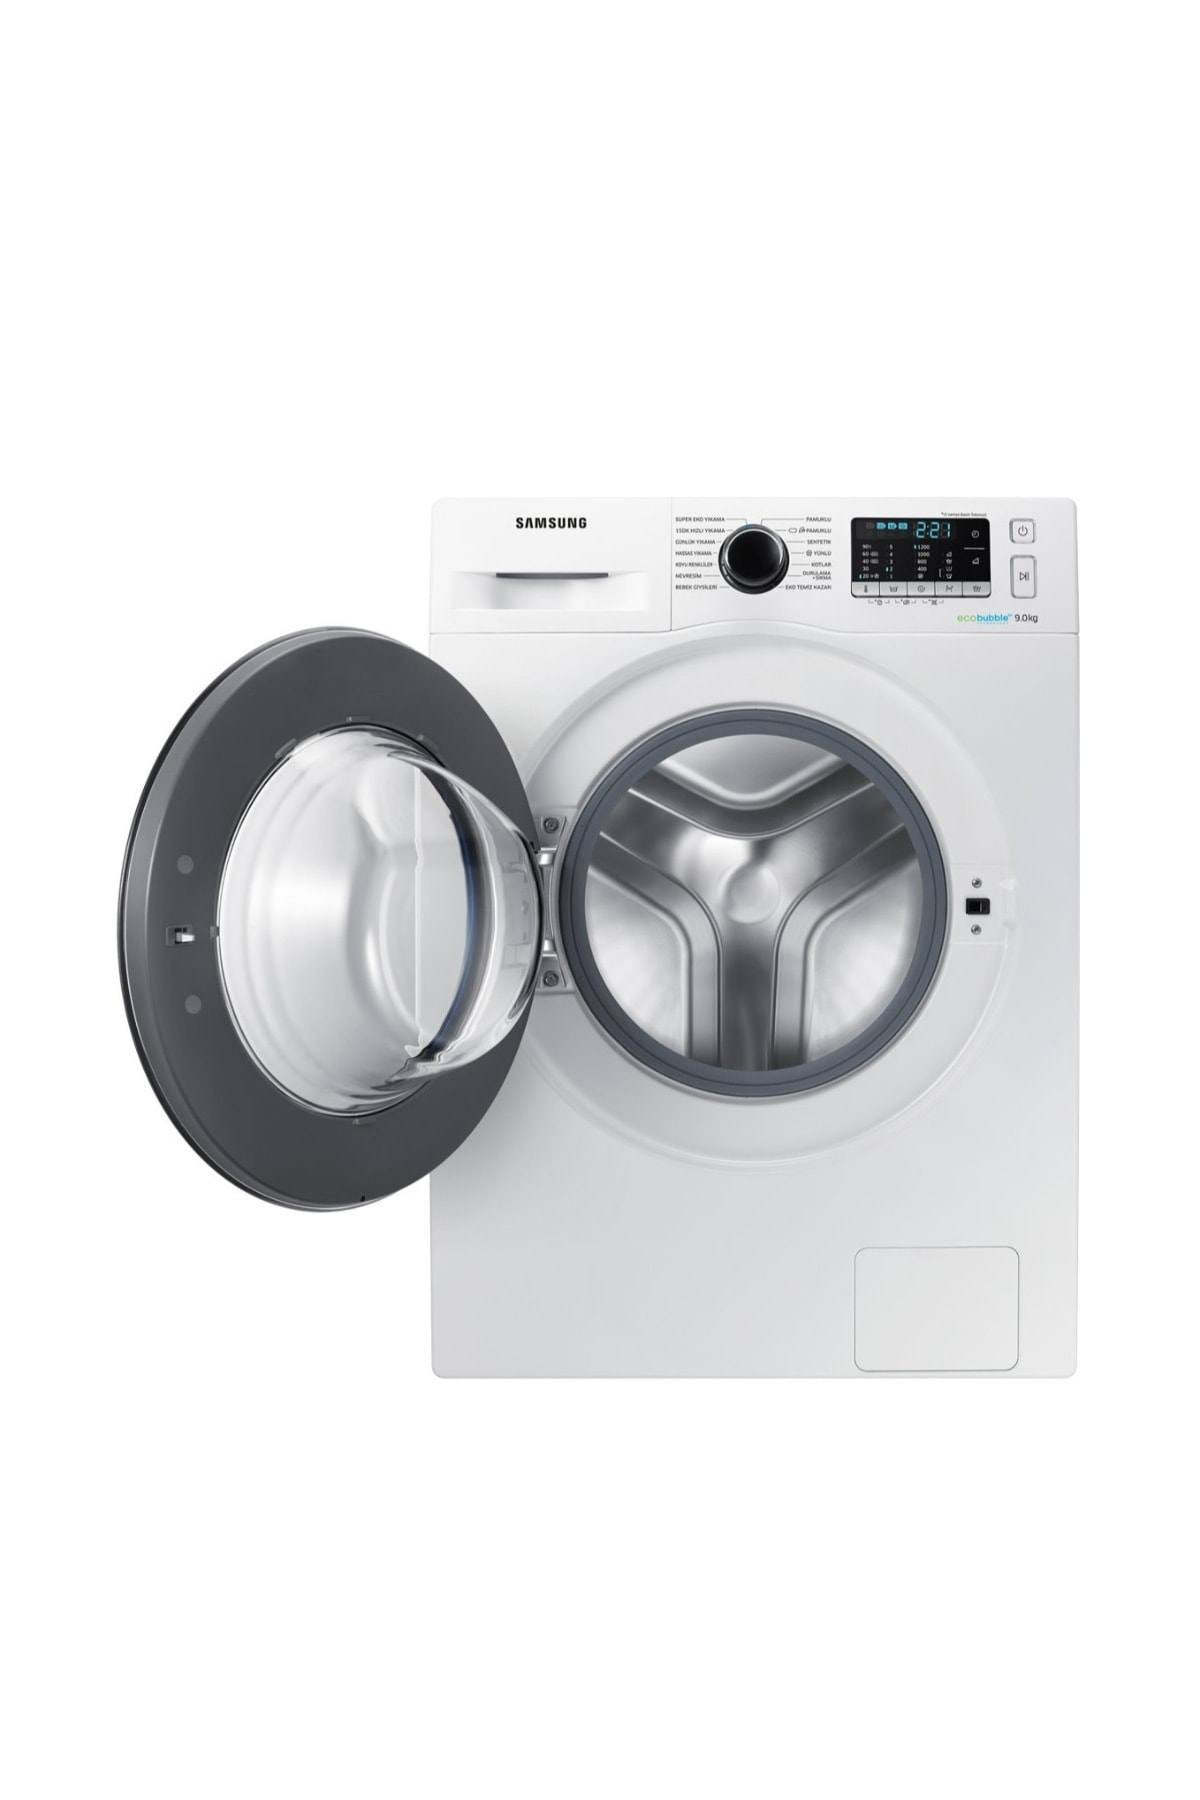 Samsung WW90J5355FW/AH A+++ 1200 Devir 9 Kg Çamaşır Makinesi 2